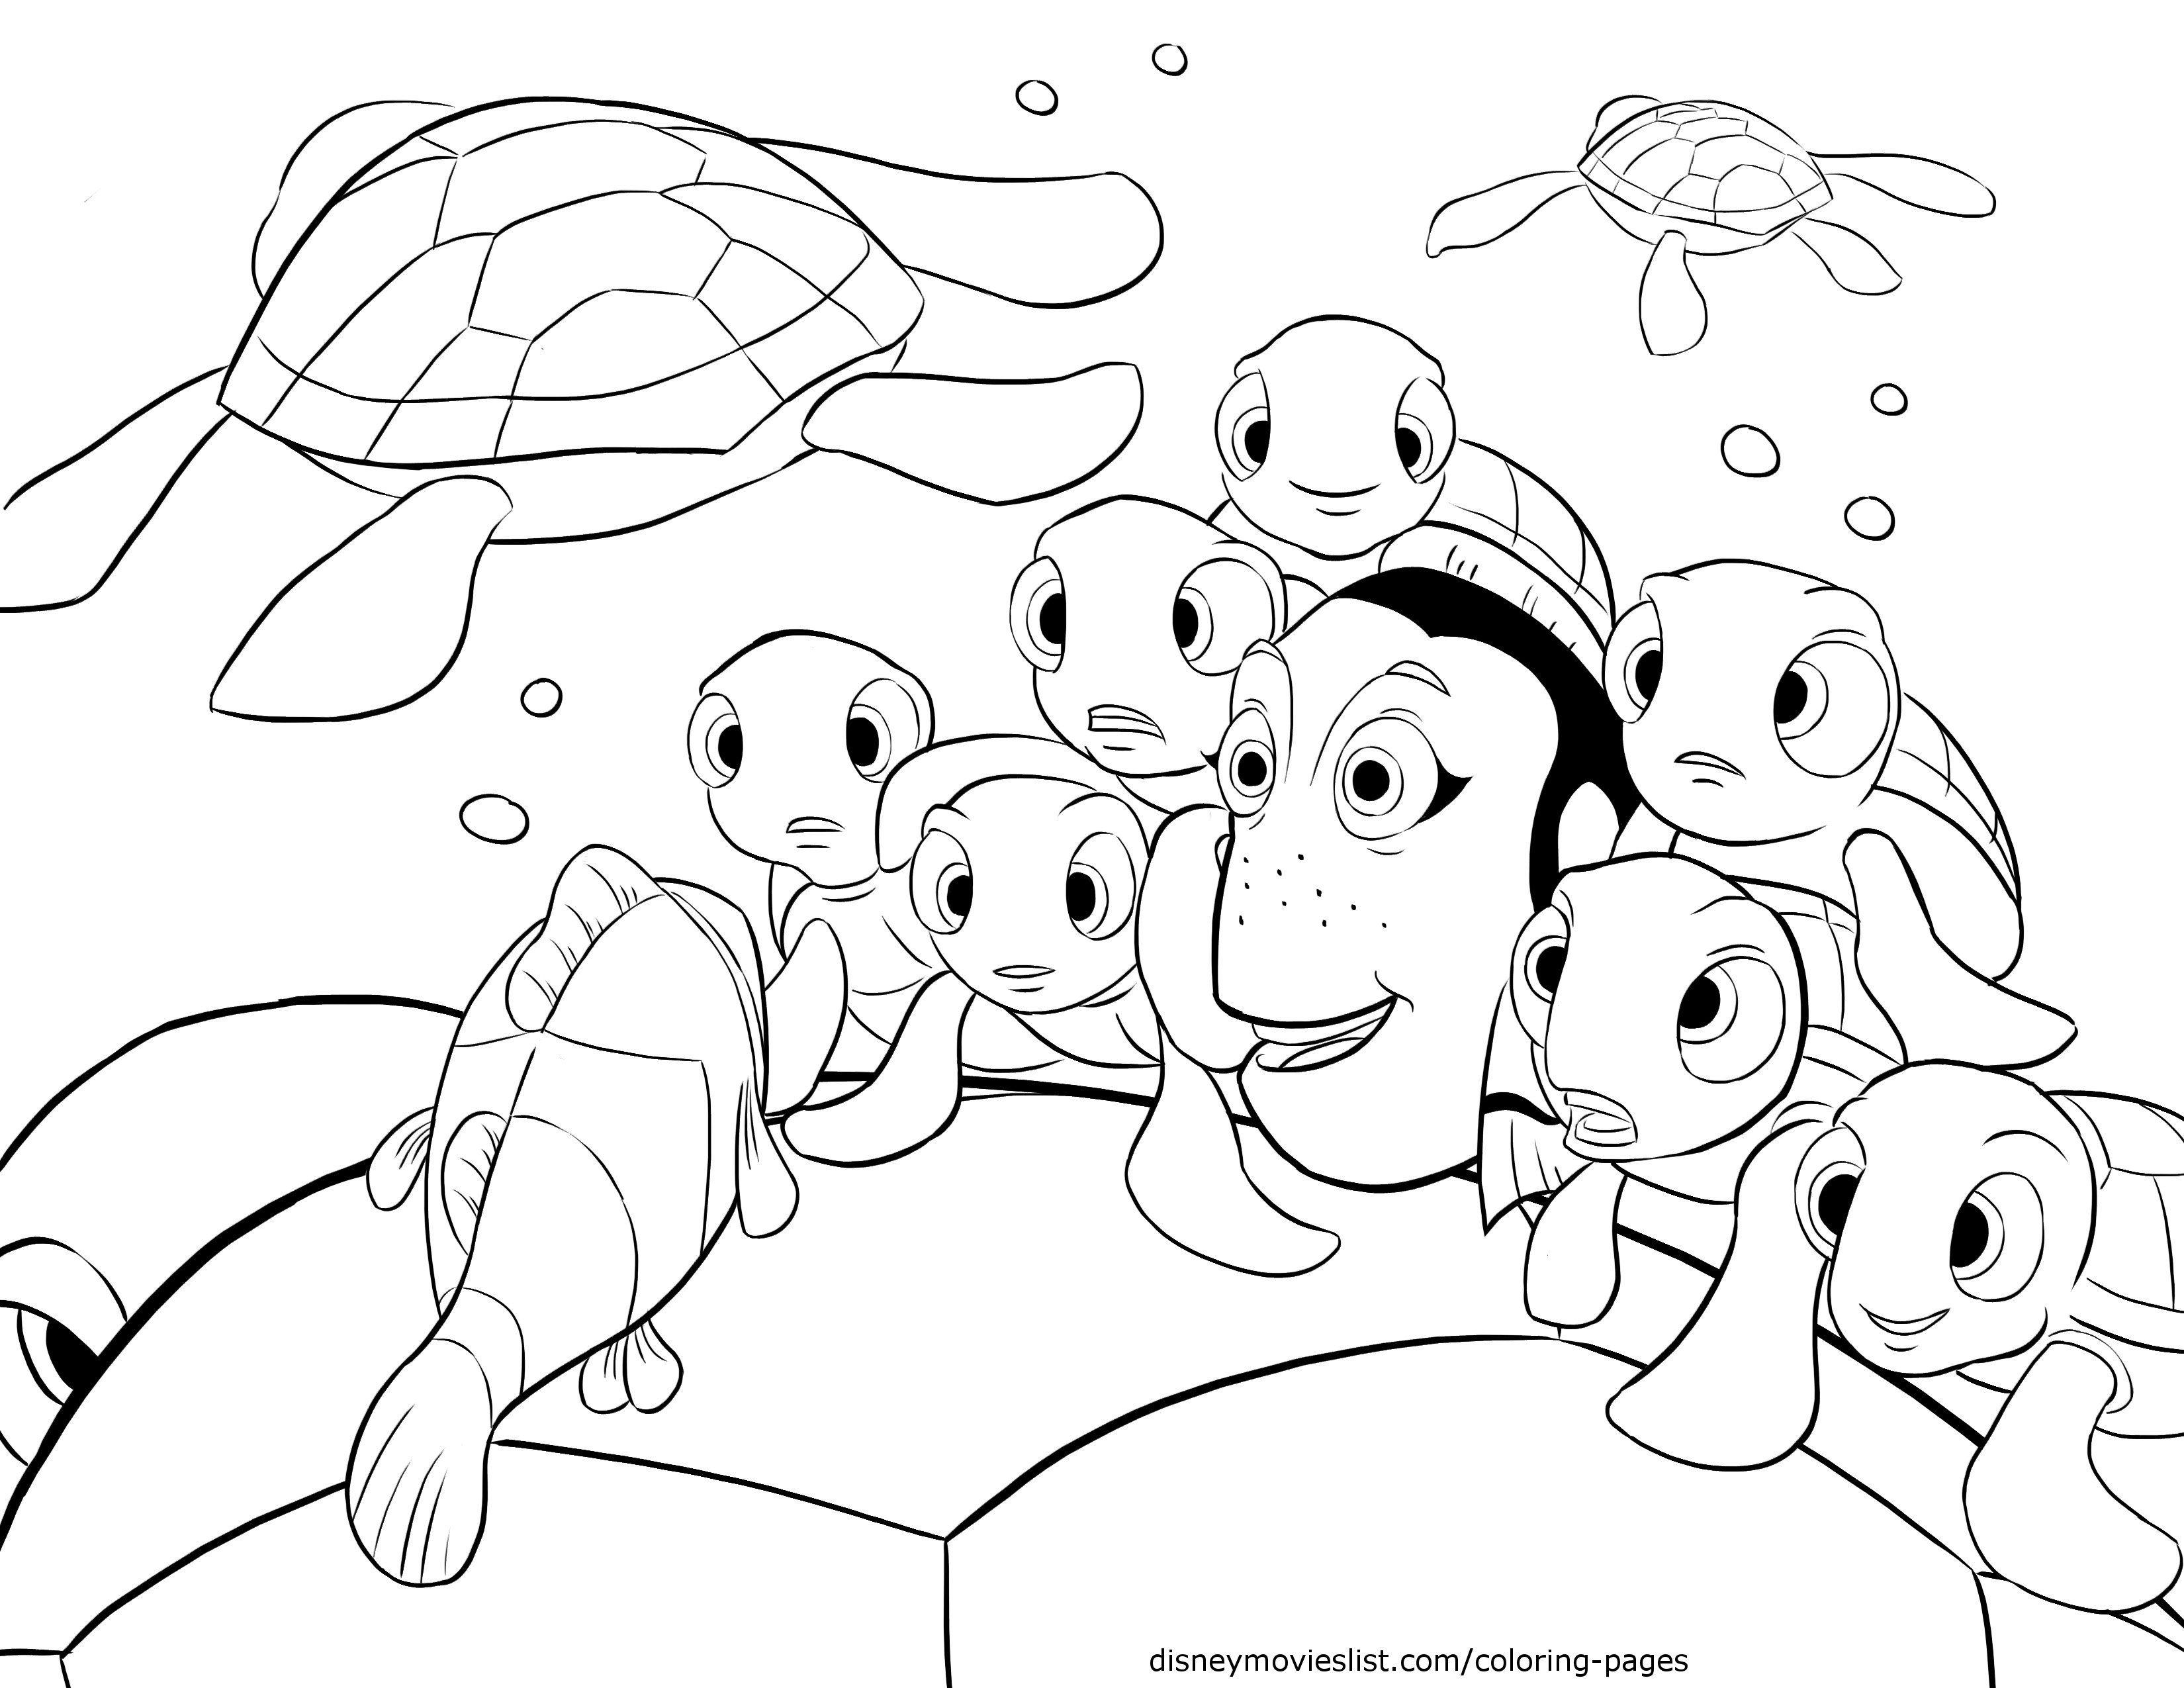 Disney's Finding Nemo Crush, Squirt Telling Stories